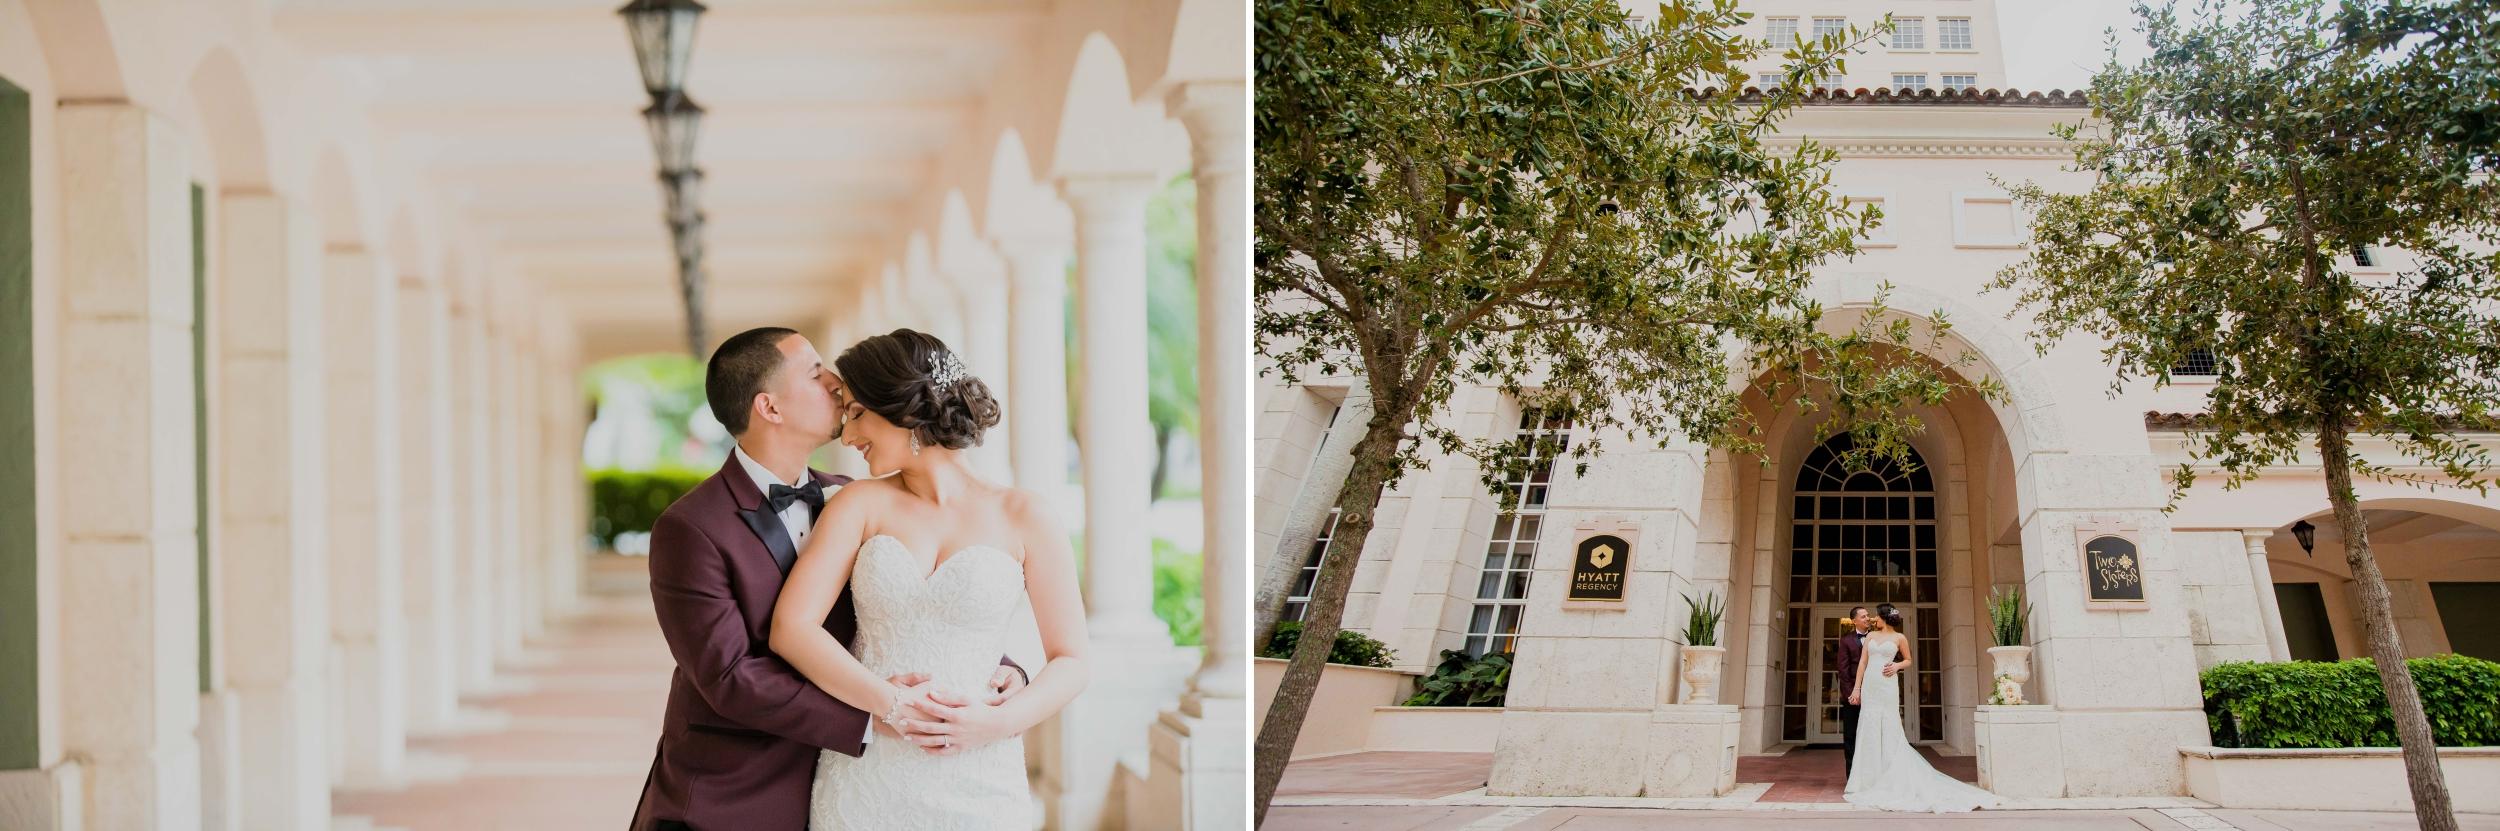 Wedding - Coco Plum - Coral Gables Congregational - Santy Martinez Photography 14.jpg